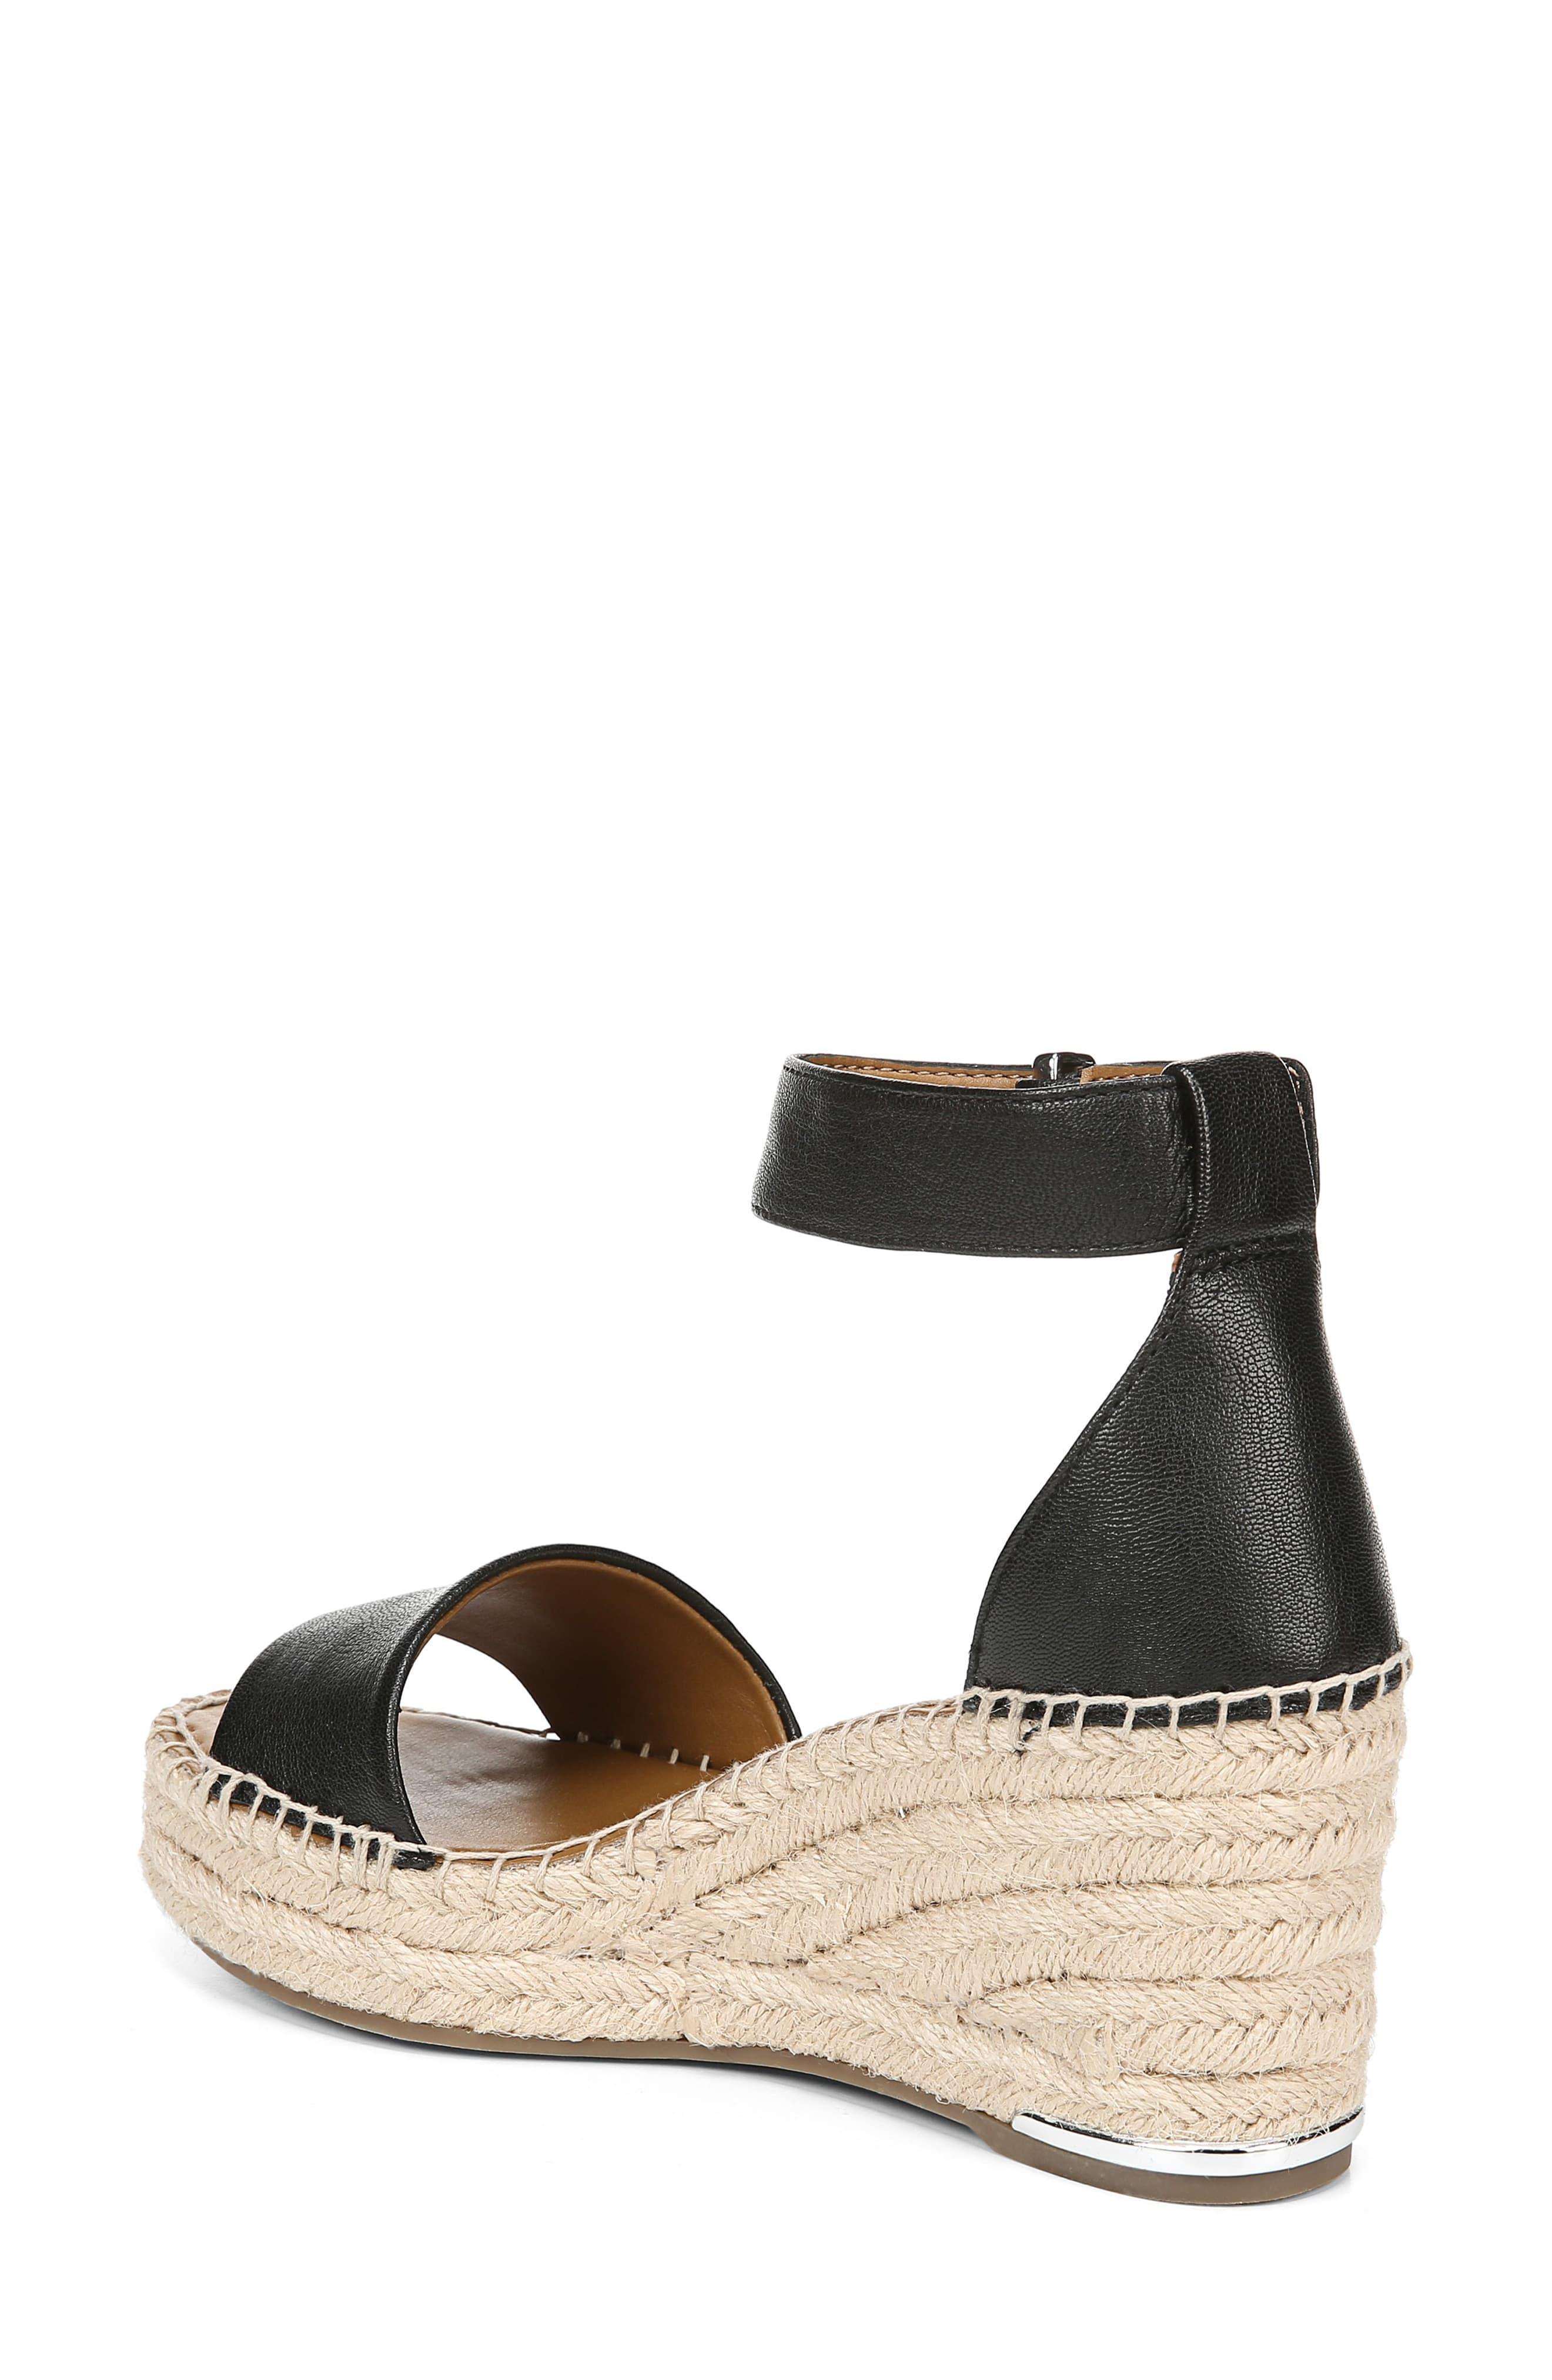 a2500f87b8a Women's Black Clemens Espadrille Wedge Sandal